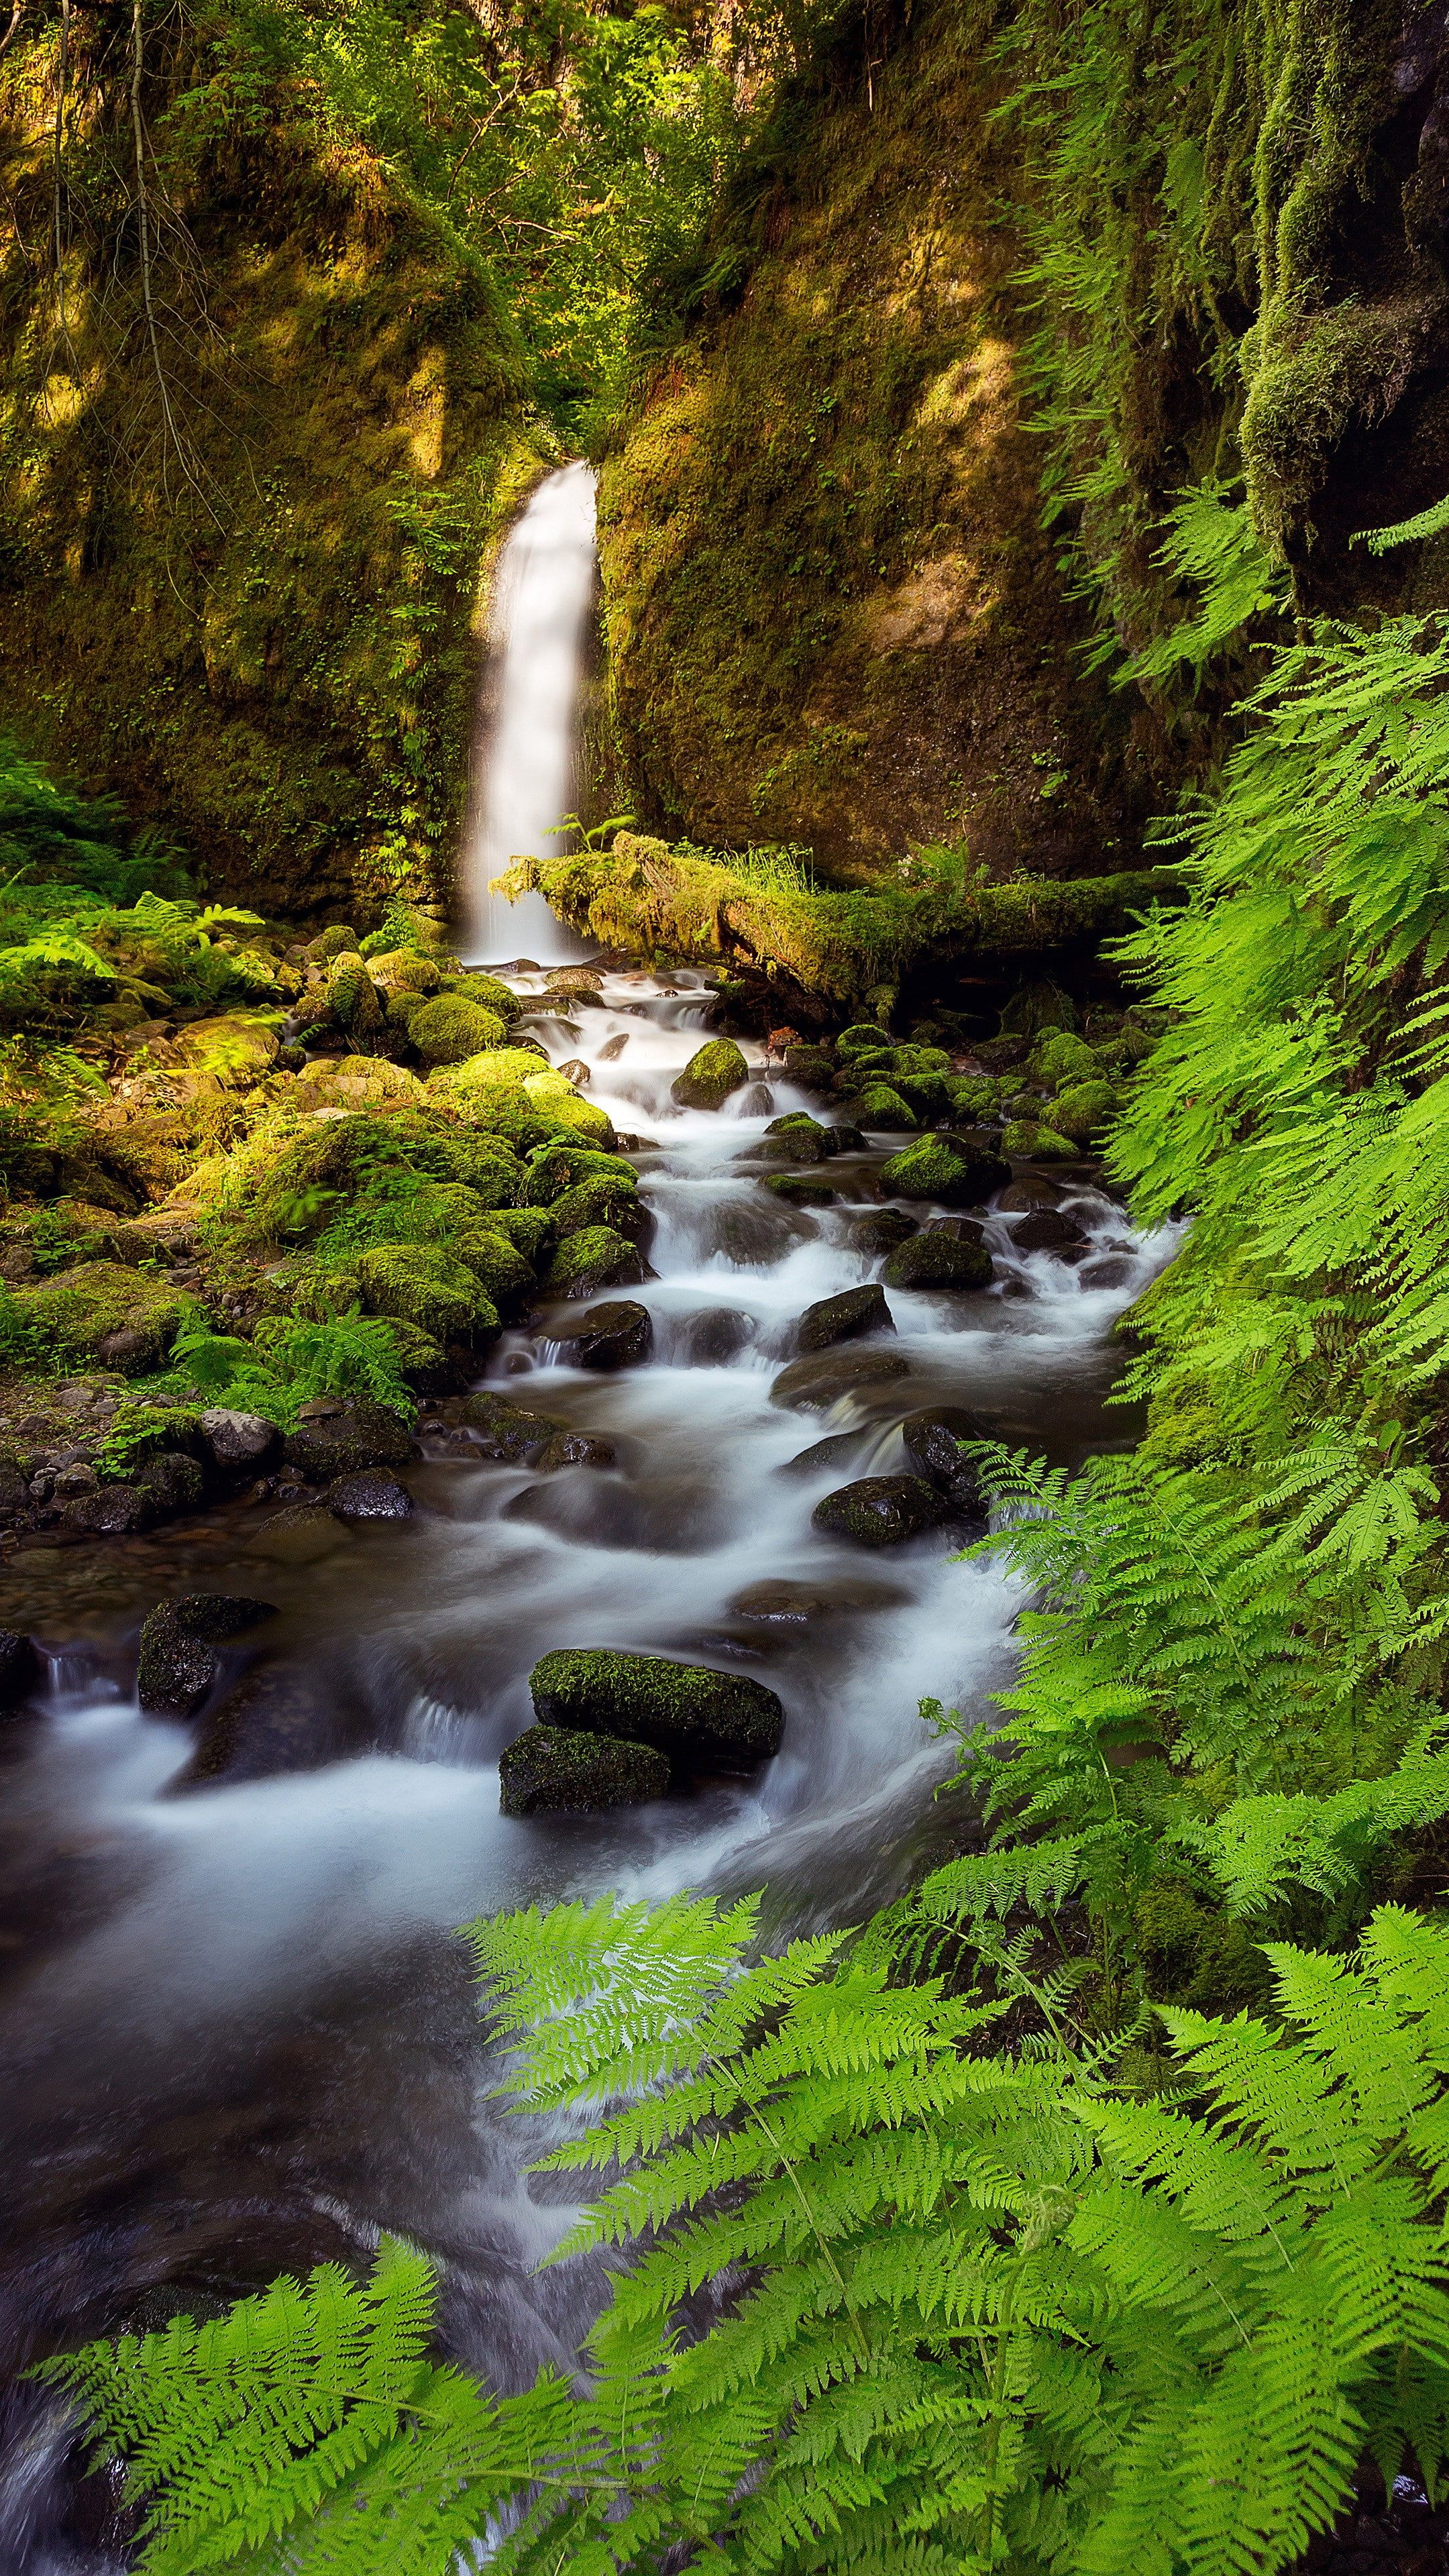 Landscape Vertical Creeks 4k Wallpaper Hdwallpaper Desktop In 2020 Beautiful Images Nature Waterfall Landscape